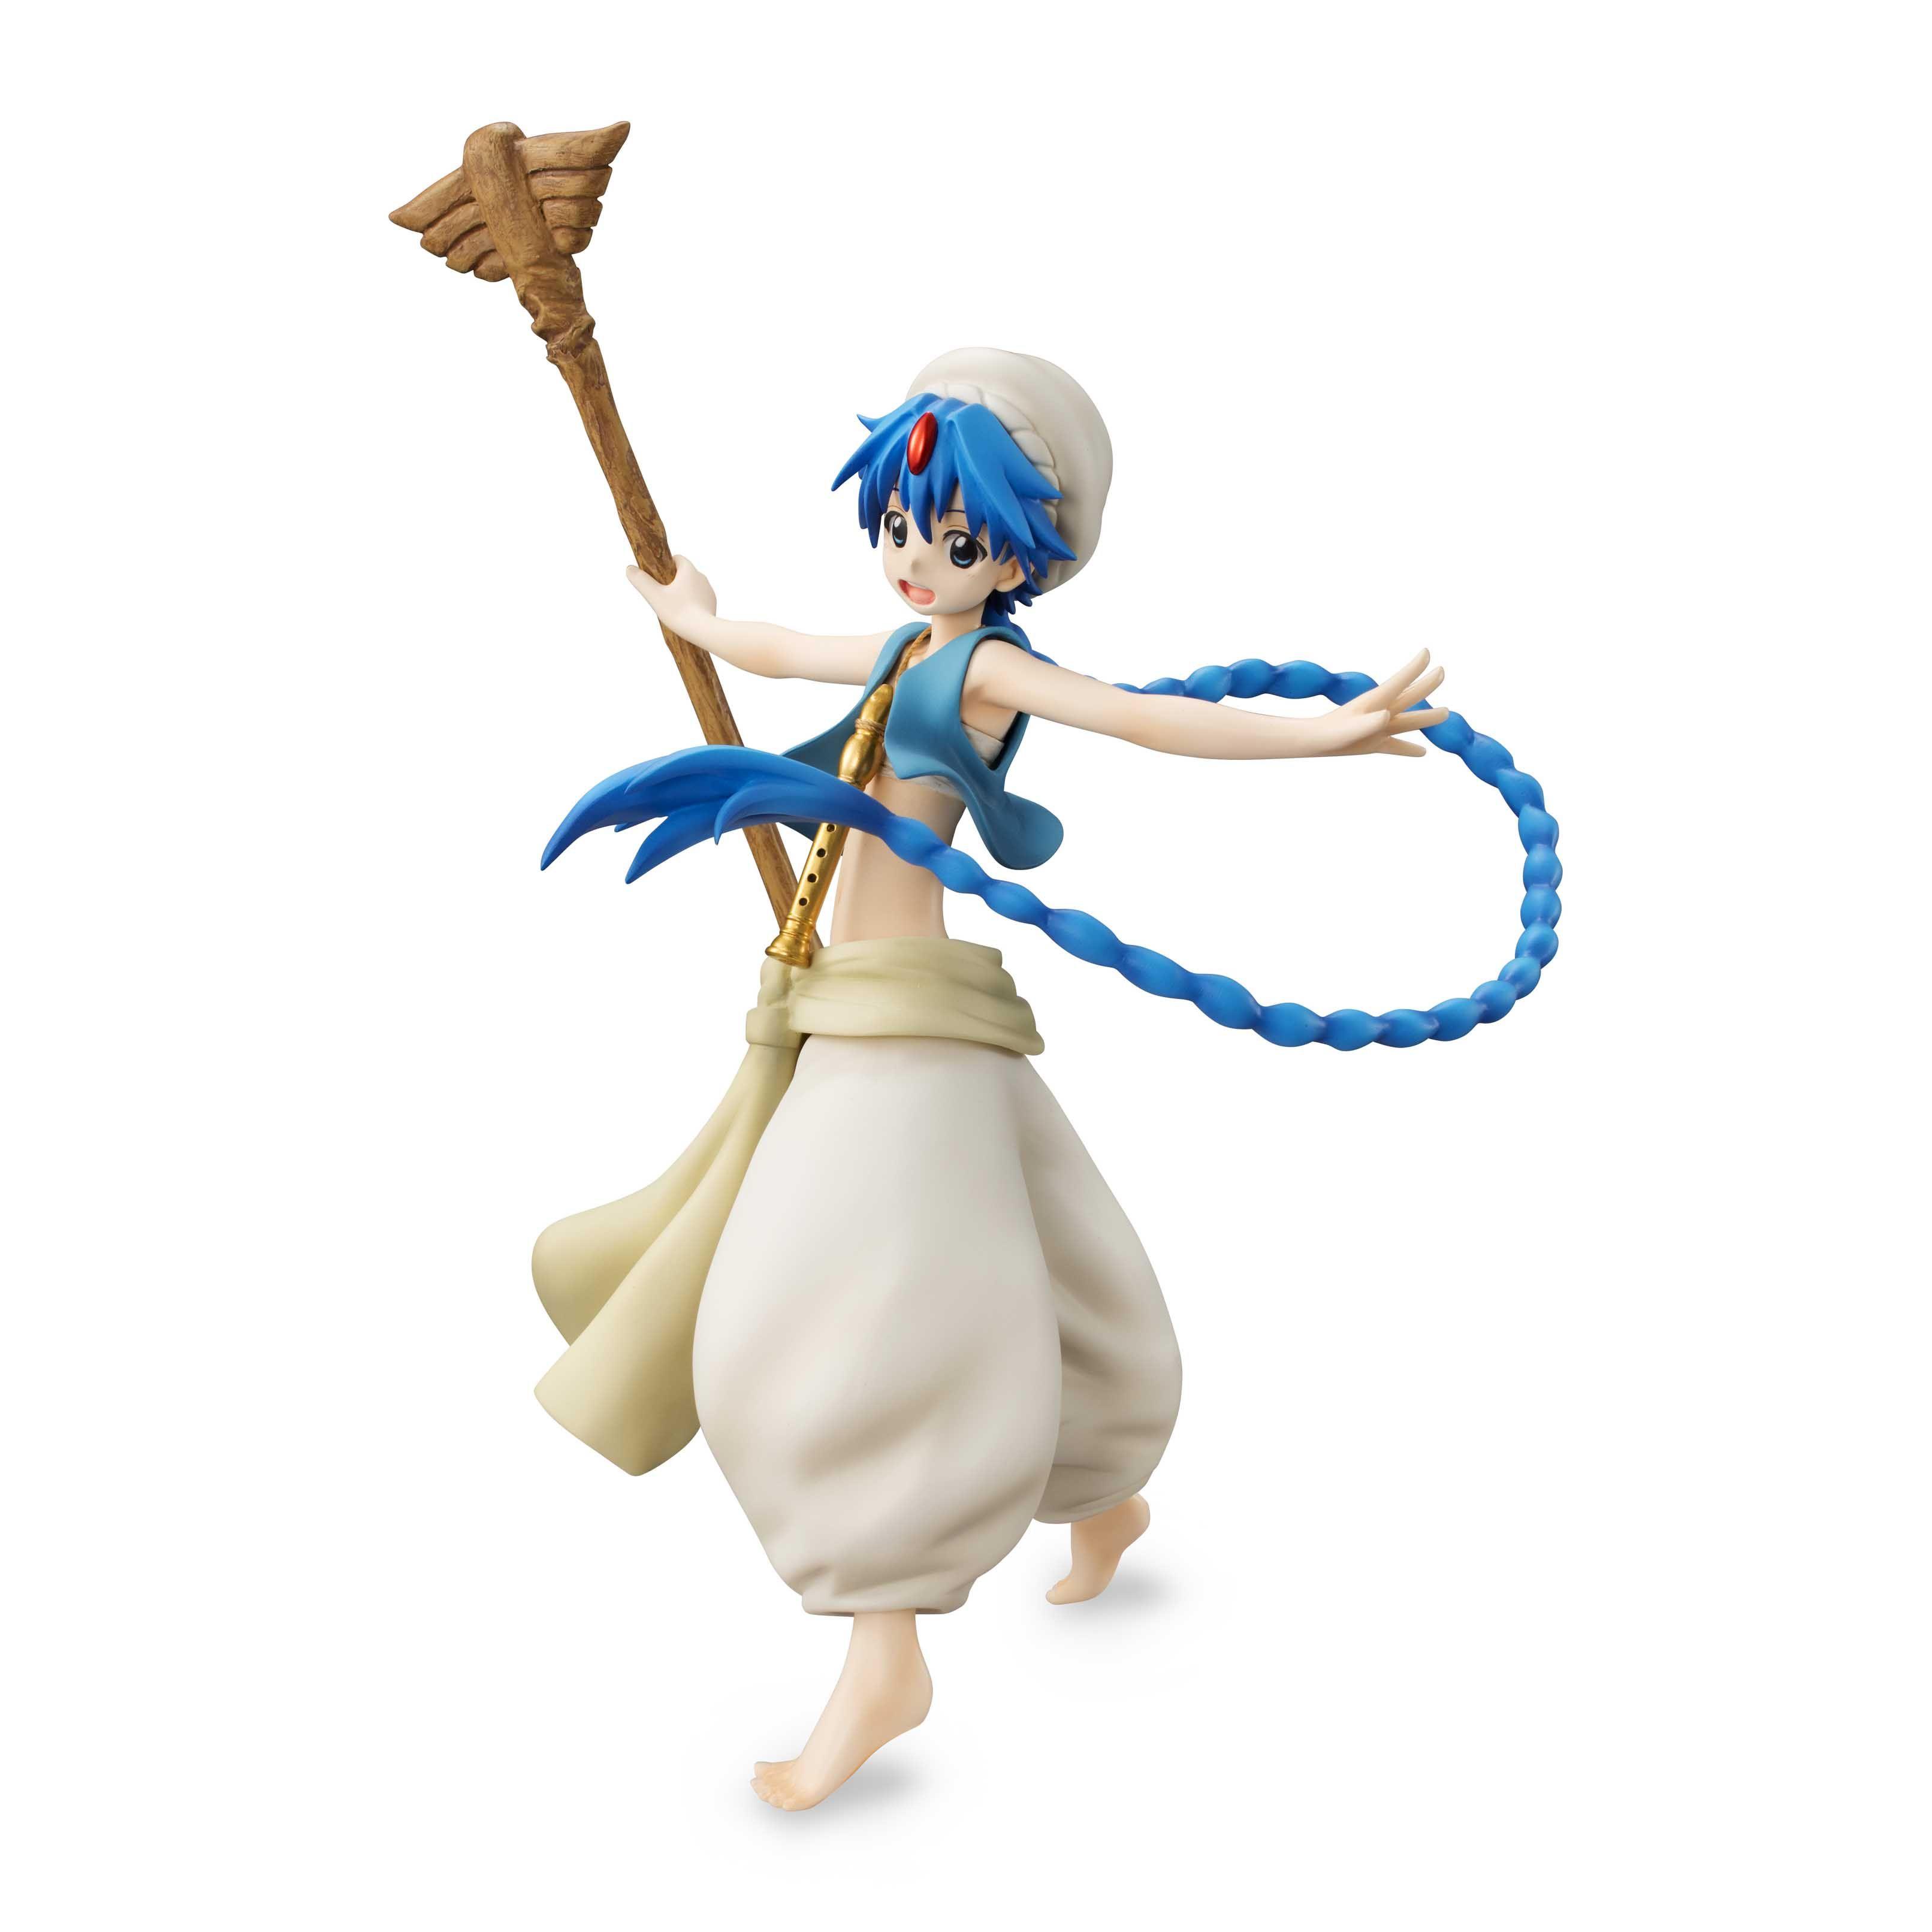 Magi Aladdin Anime Wallpaper Pinterest Anime